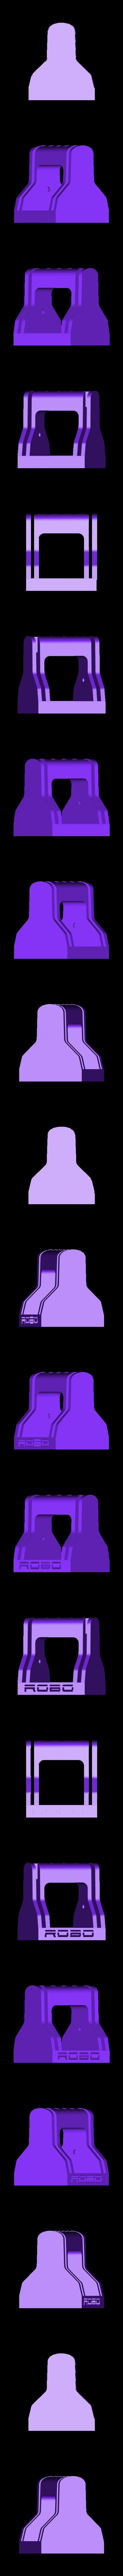 R1_white.STL Download free STL file Multi-Color Robo R1 USB Holder • 3D print model, MosaicManufacturing